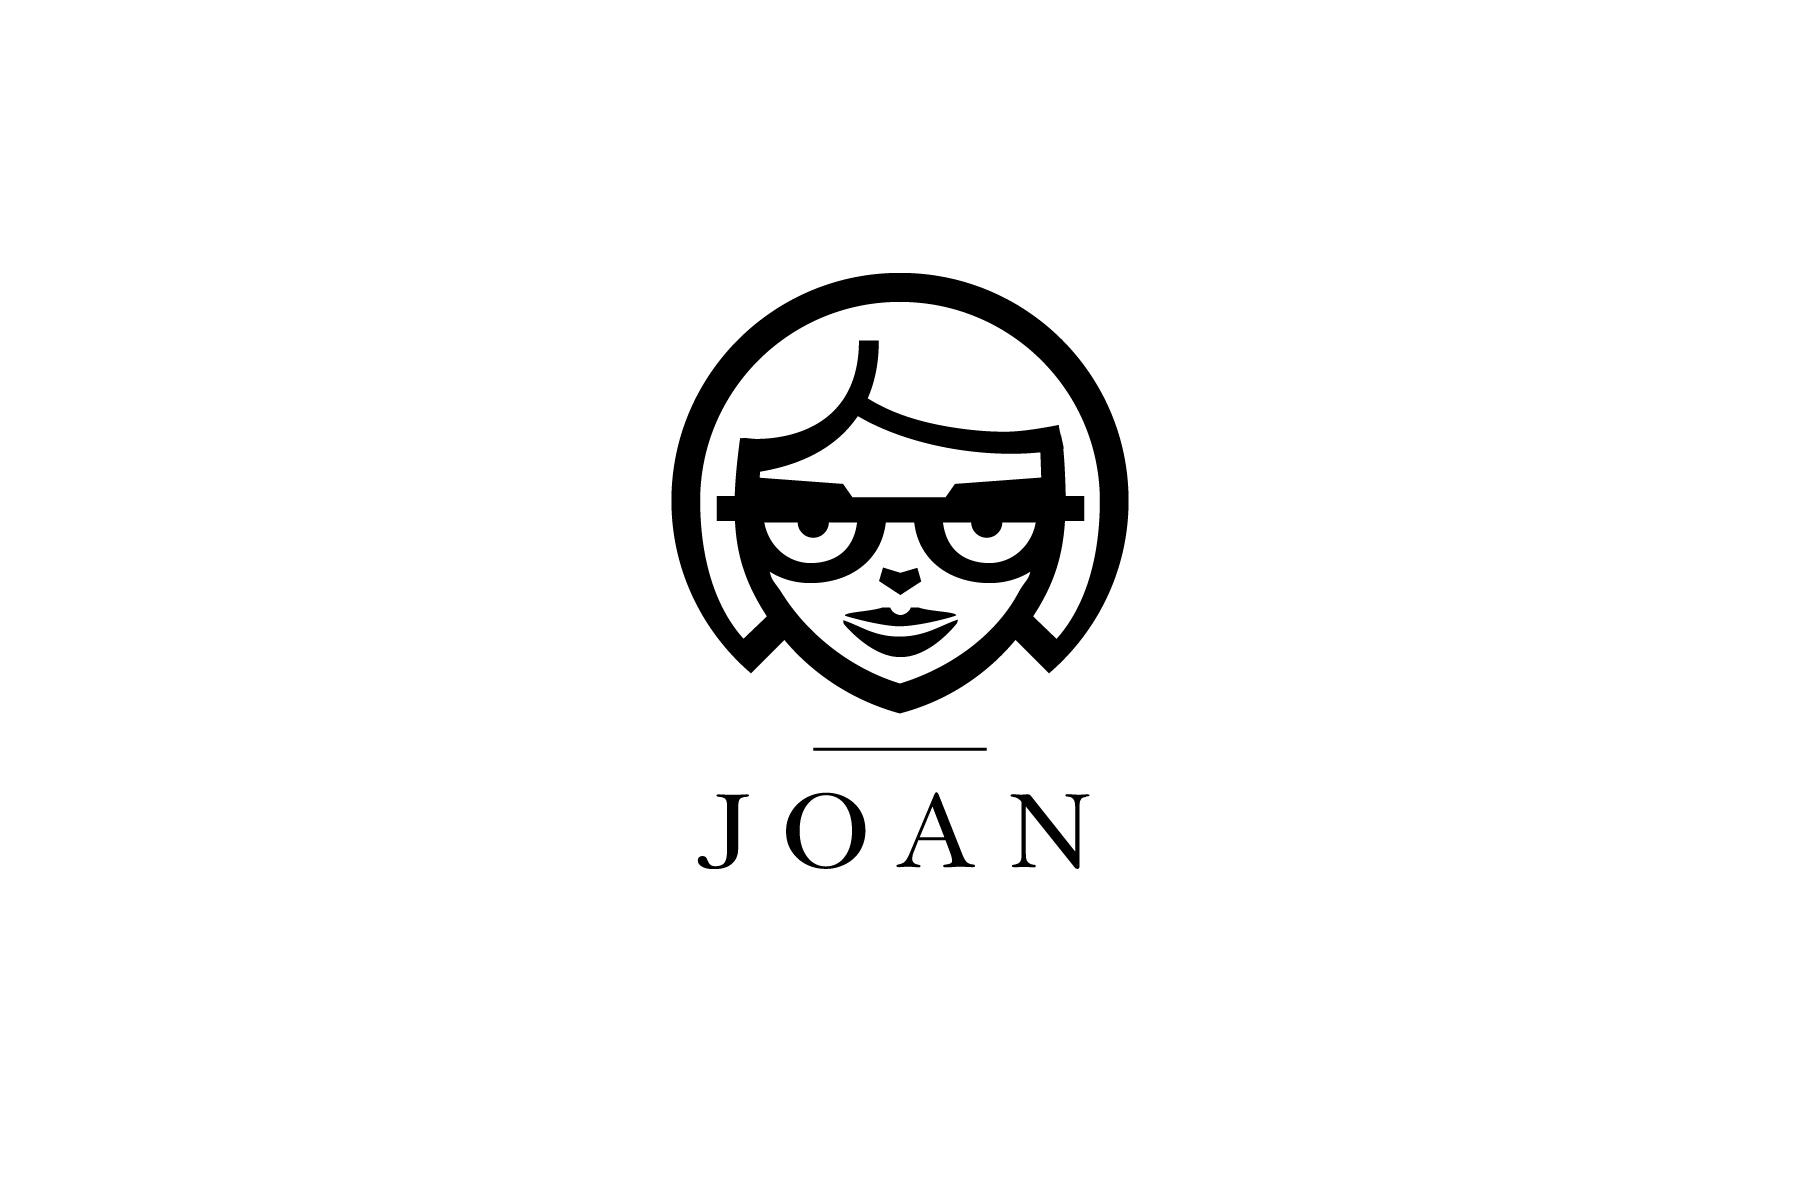 Famous Joans across the ages